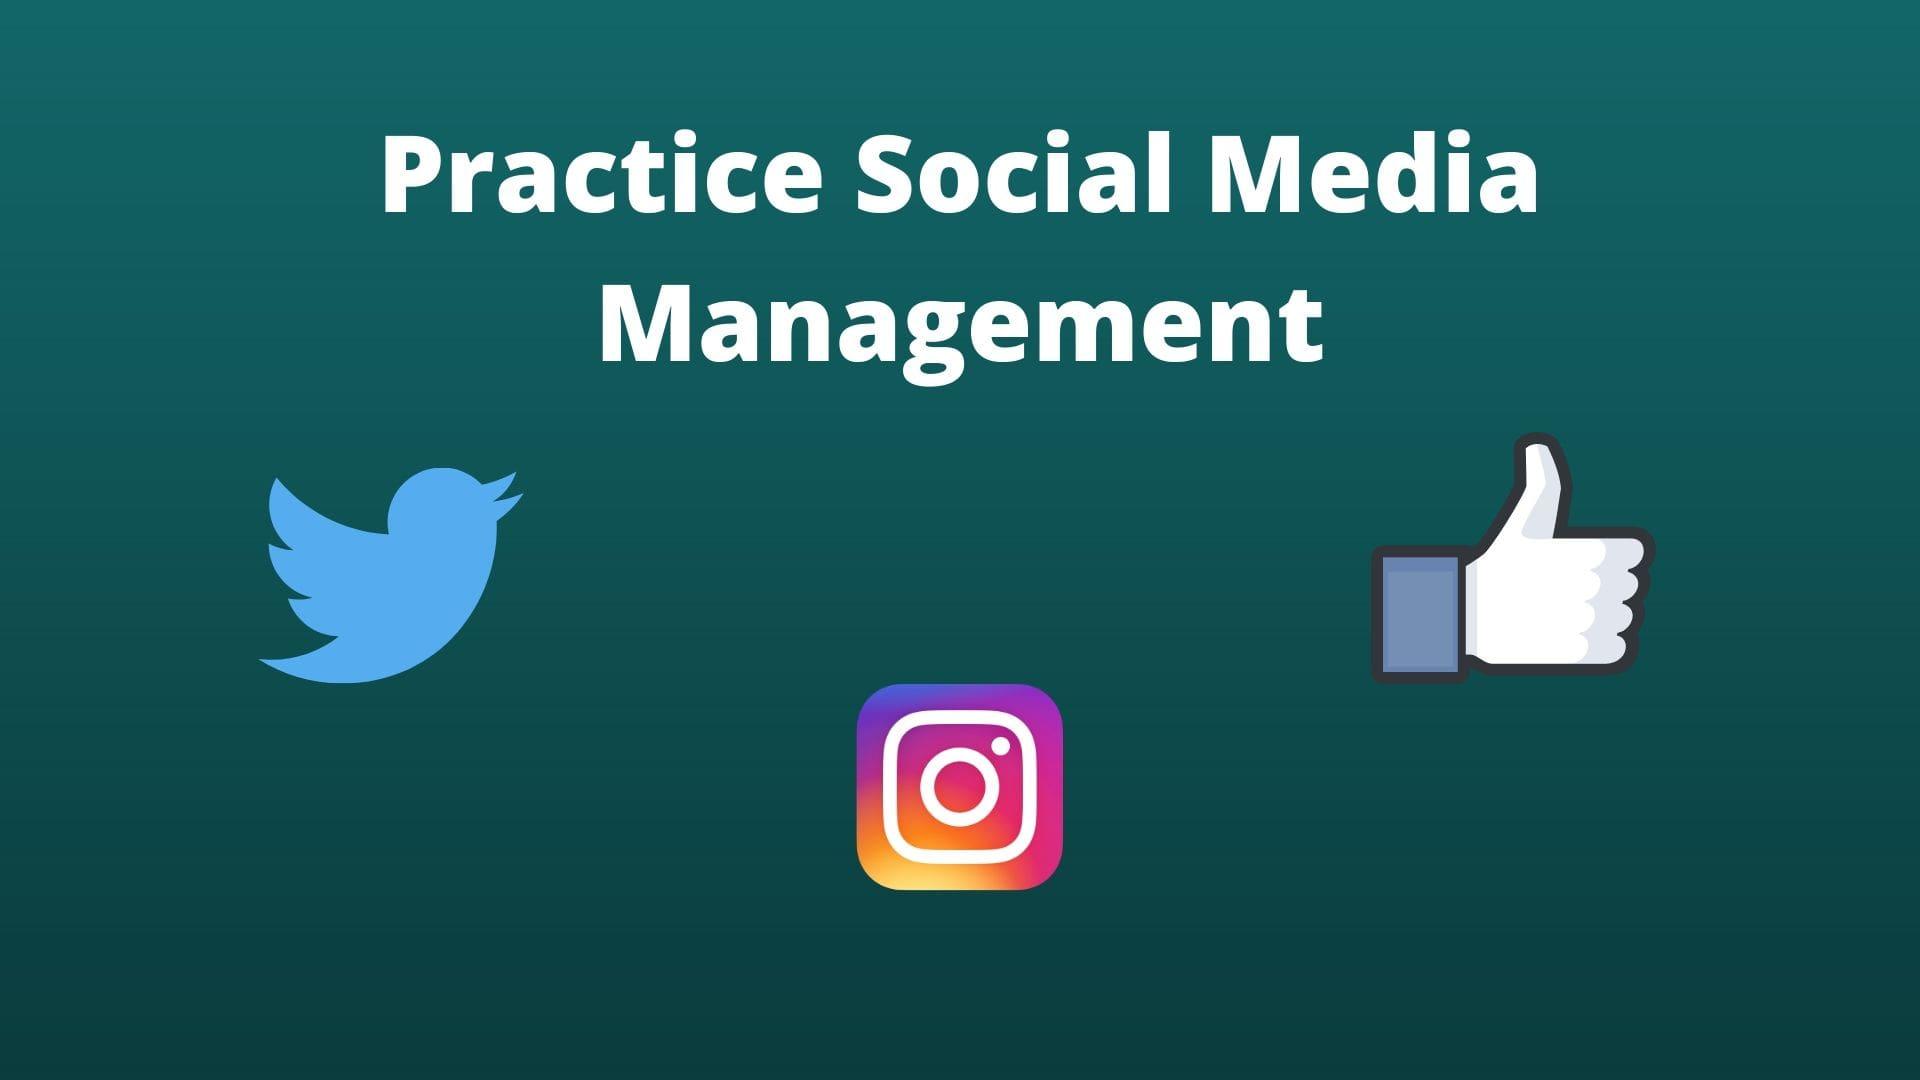 Practice Social Media Management